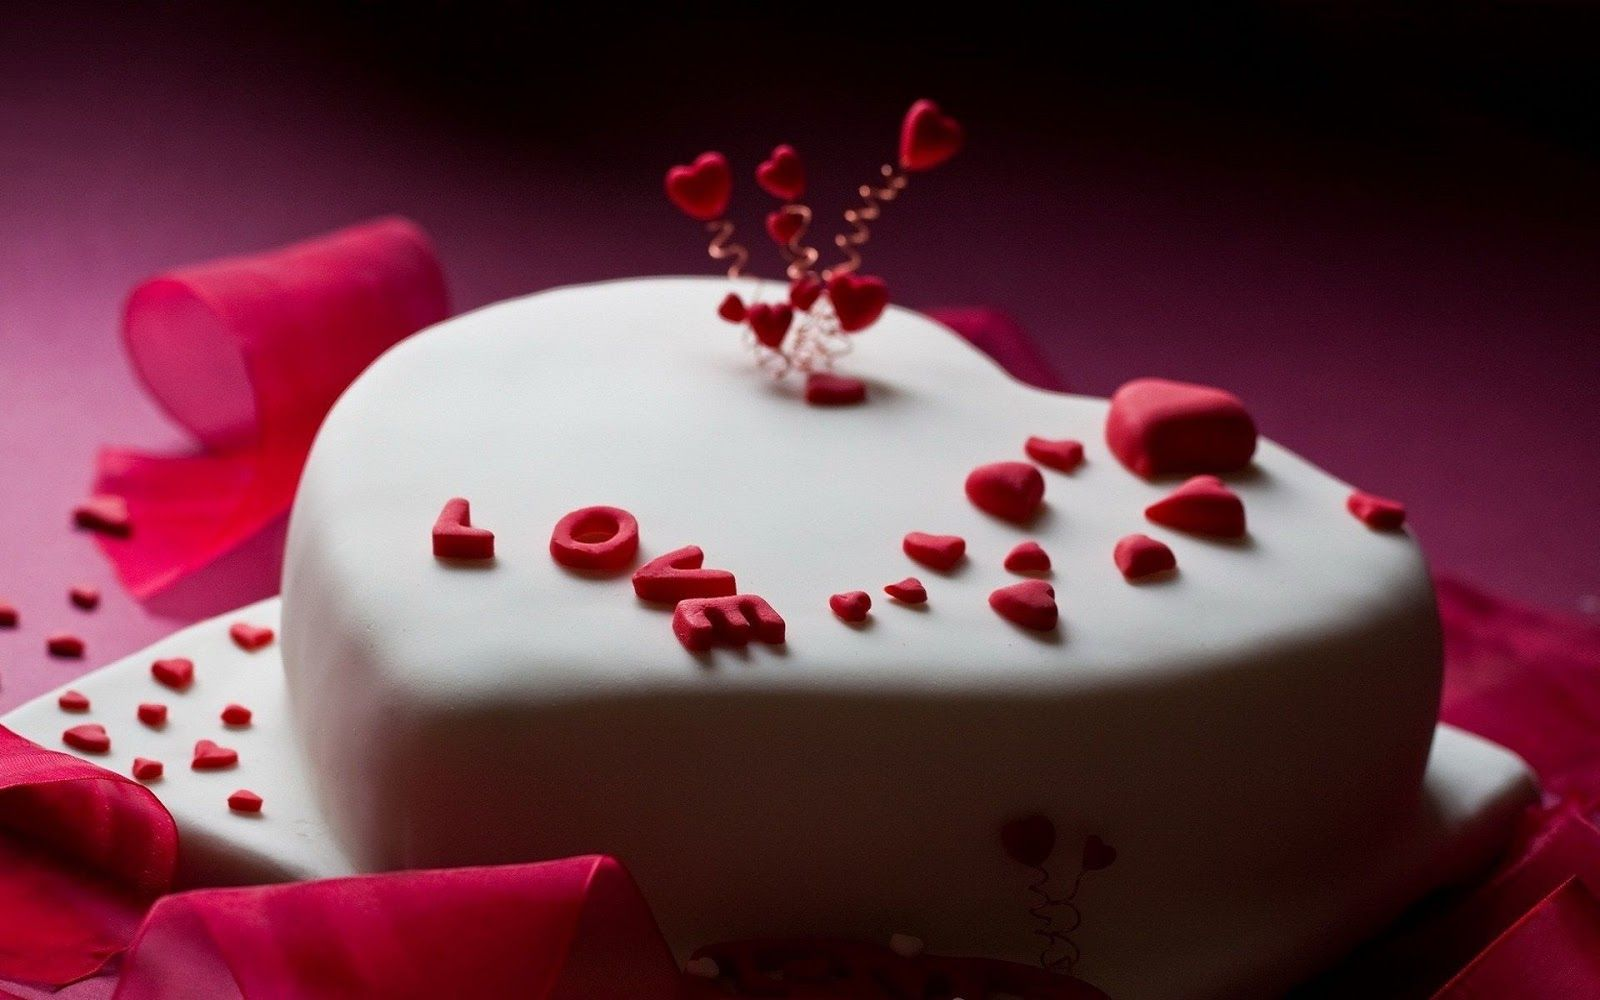 10 Birthday Cake For Husband Cake For Husband Birthday Cake For Husband New Birthday Cake